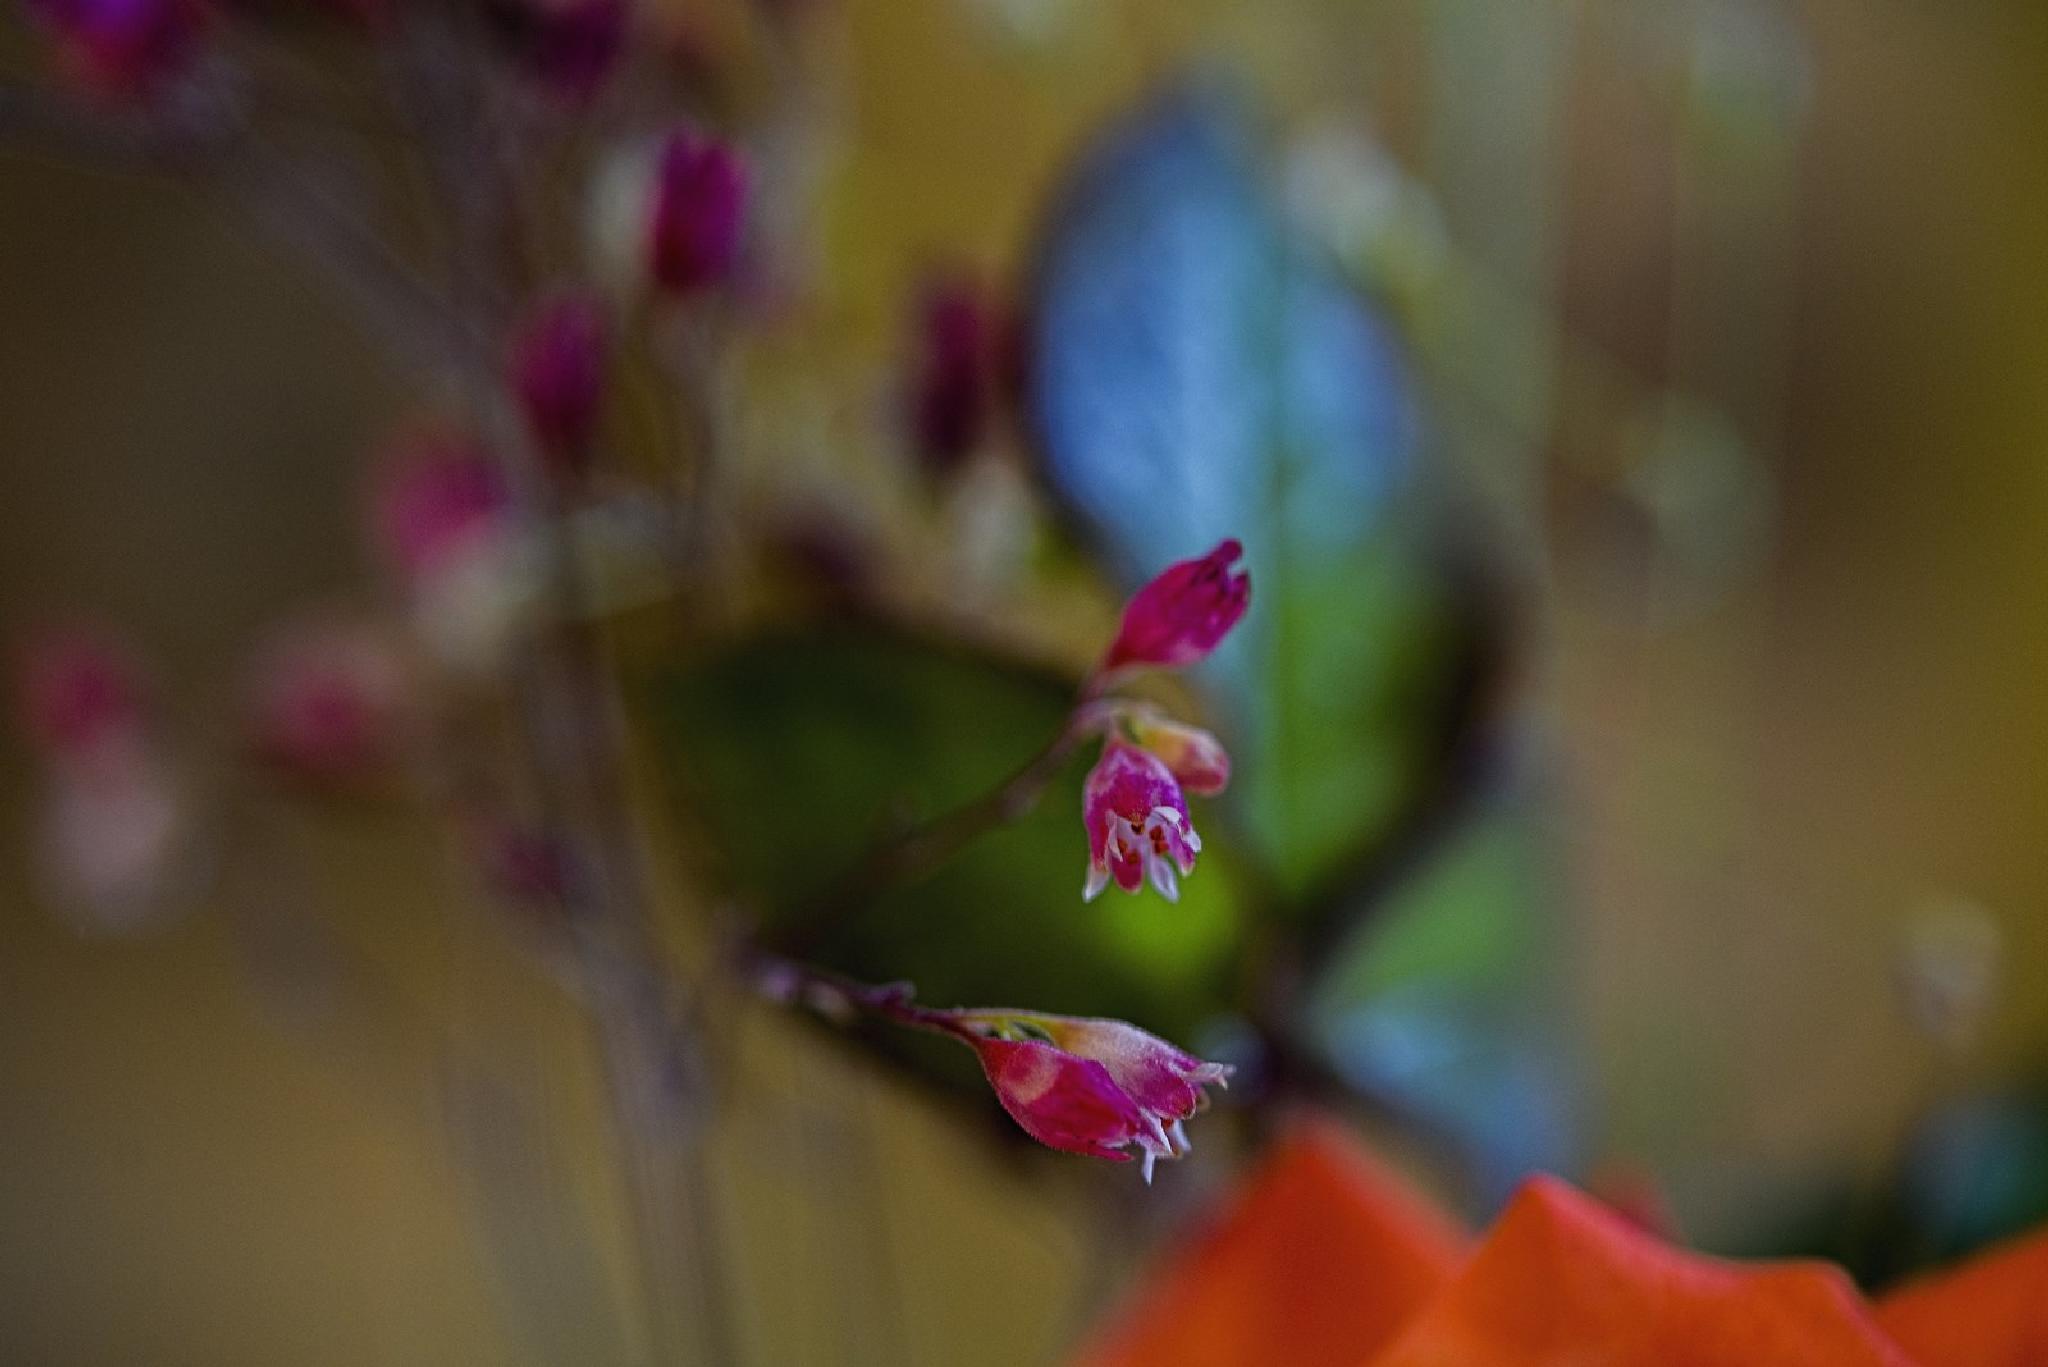 A bouquet of flowers and its secrets_07 by Waldemar Sadlowski